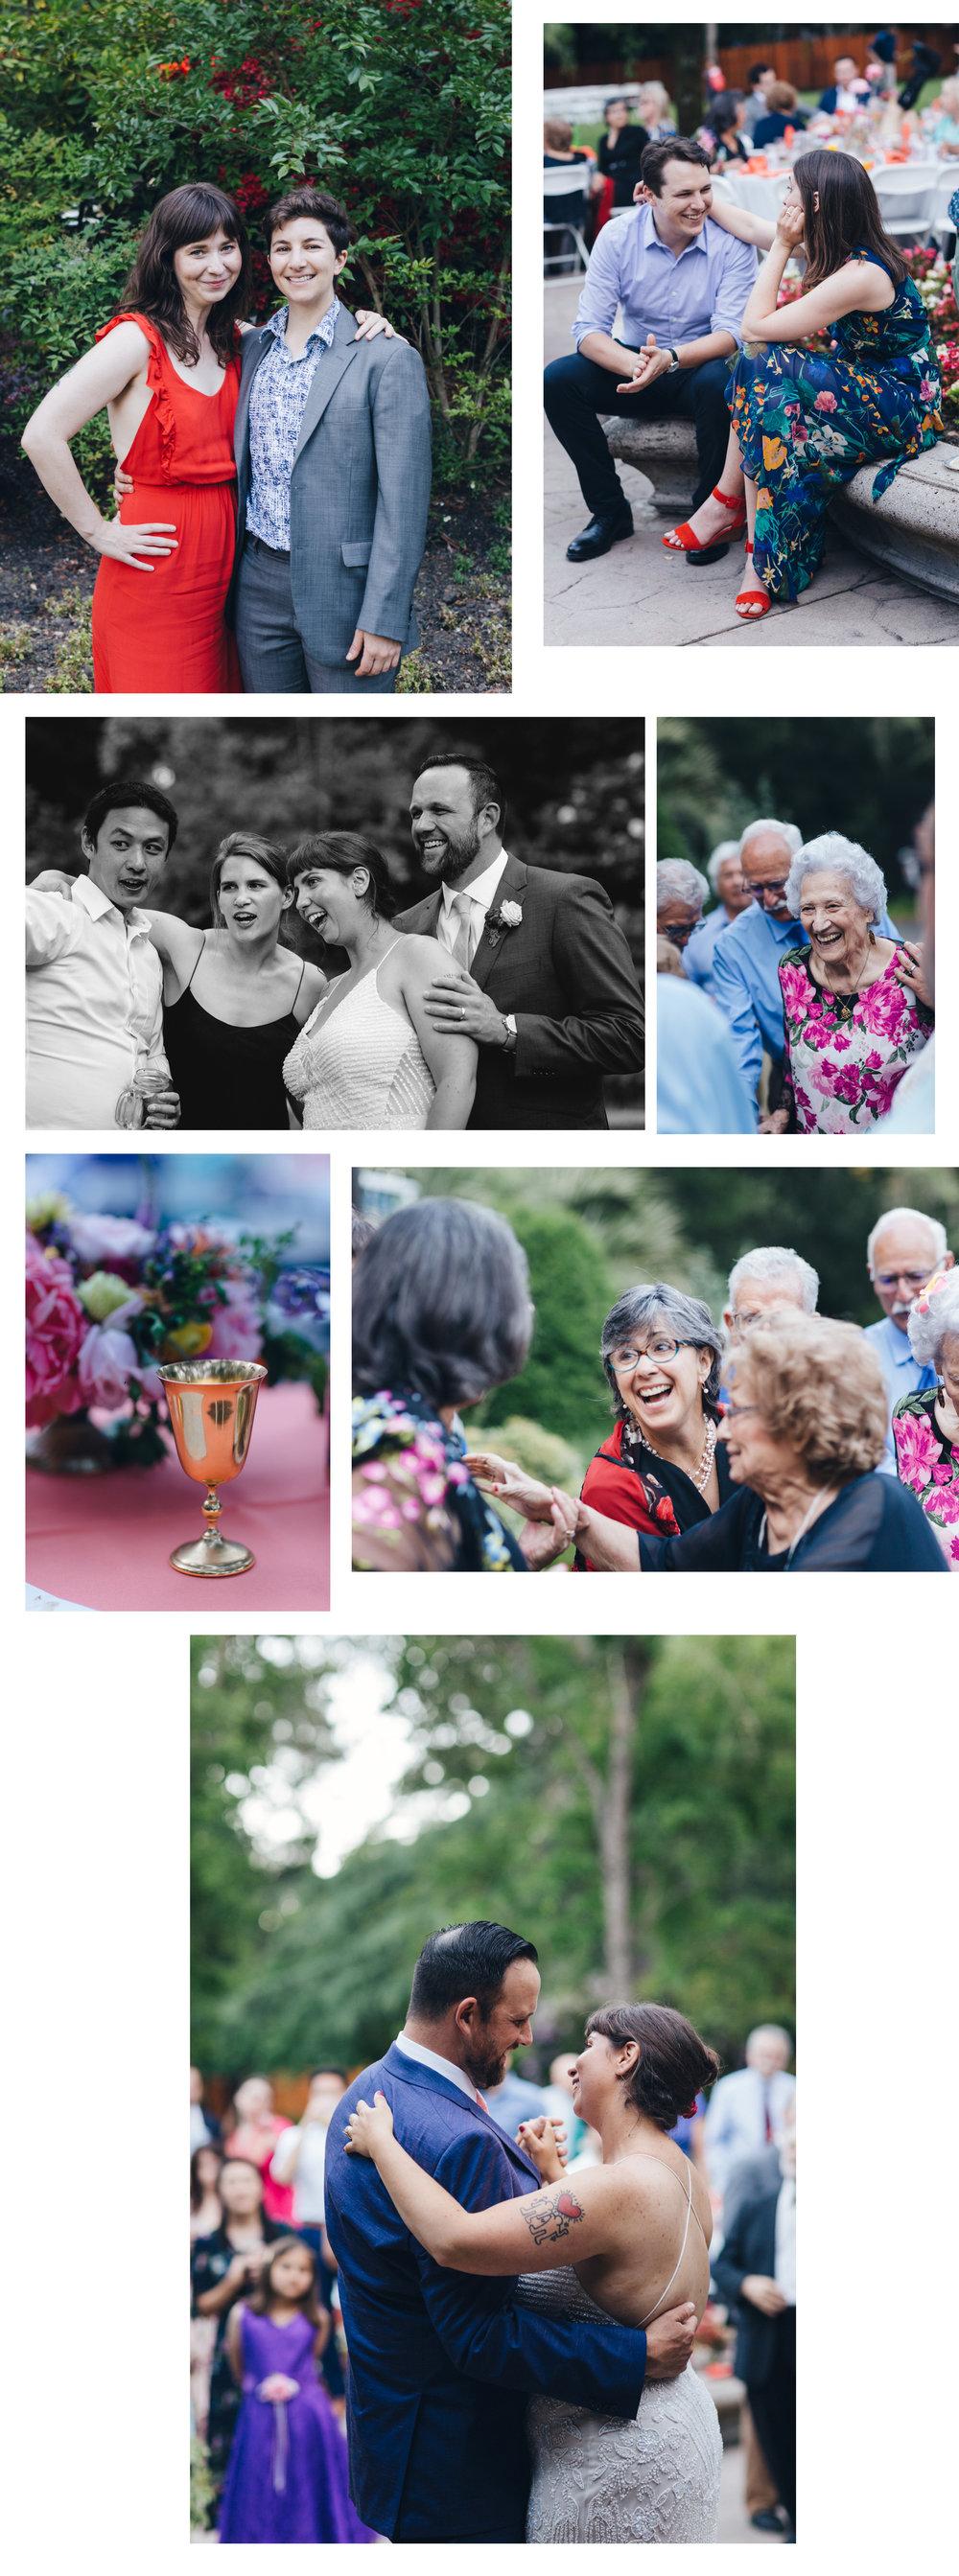 IG_wedding (65 of 110) copy.jpg